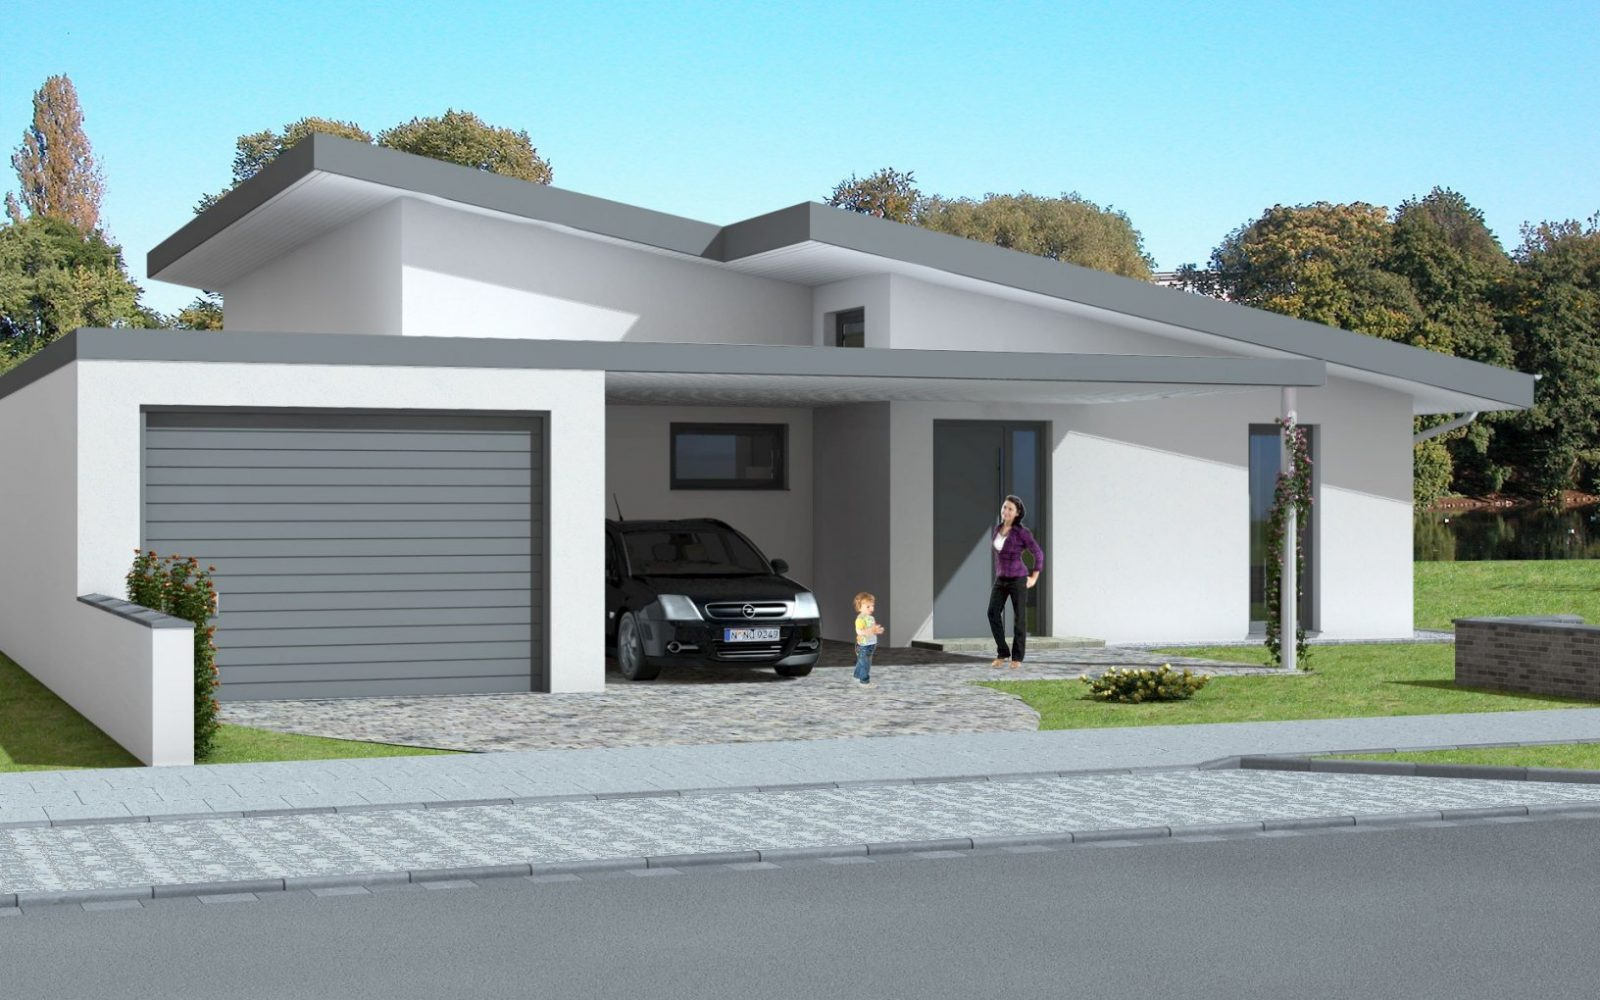 bungalow selber bauen kosten haus design ideen. Black Bedroom Furniture Sets. Home Design Ideas